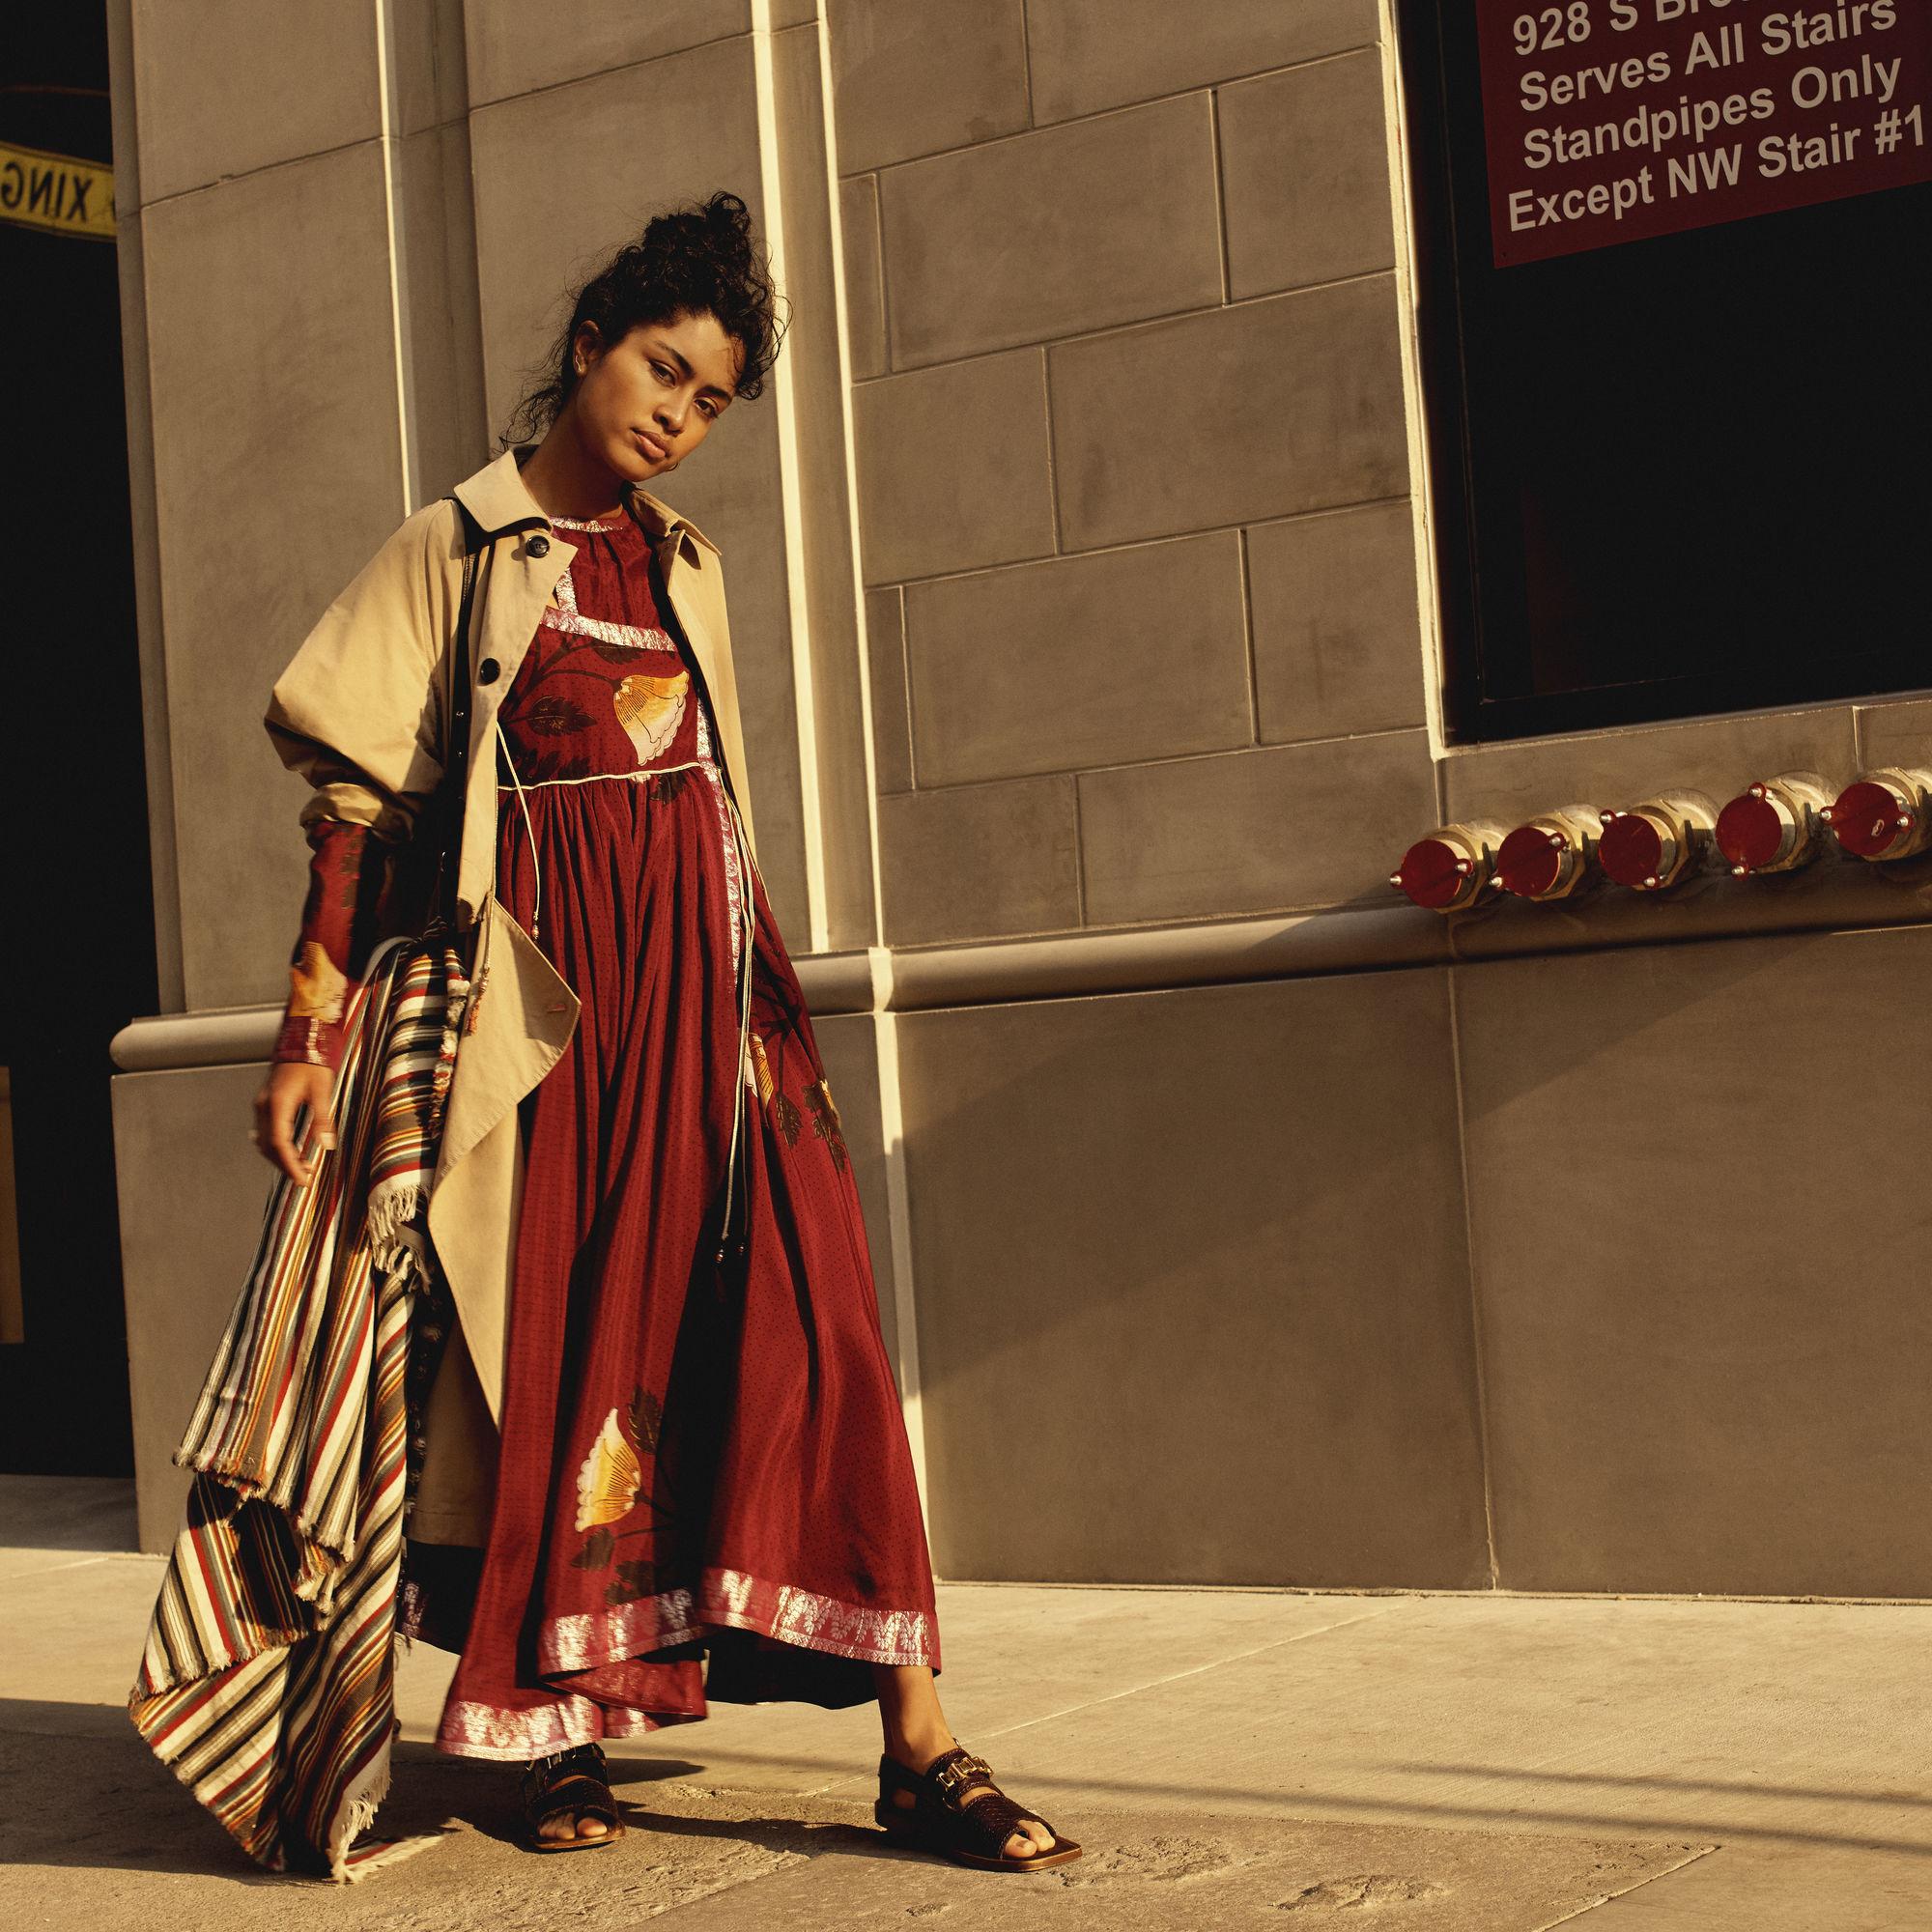 GLAMPR: Top Model Luz PAVON for ELLE UK March 18